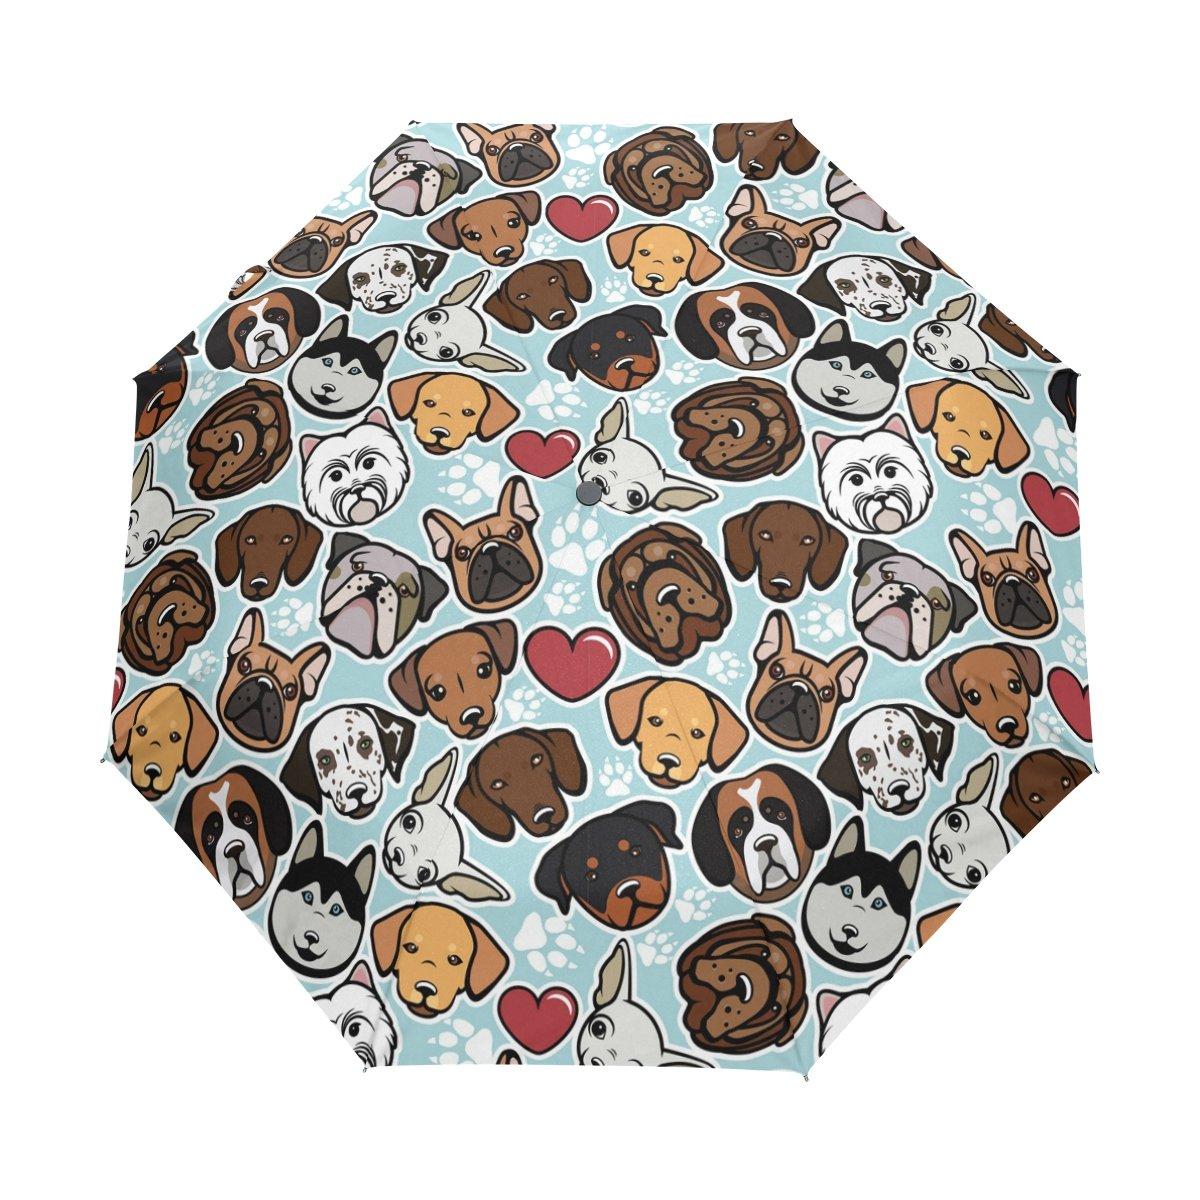 WOZO Hipster Paw Print Pug Dog 3 Folds Auto Open Close Umbrella   B074N3RFGM